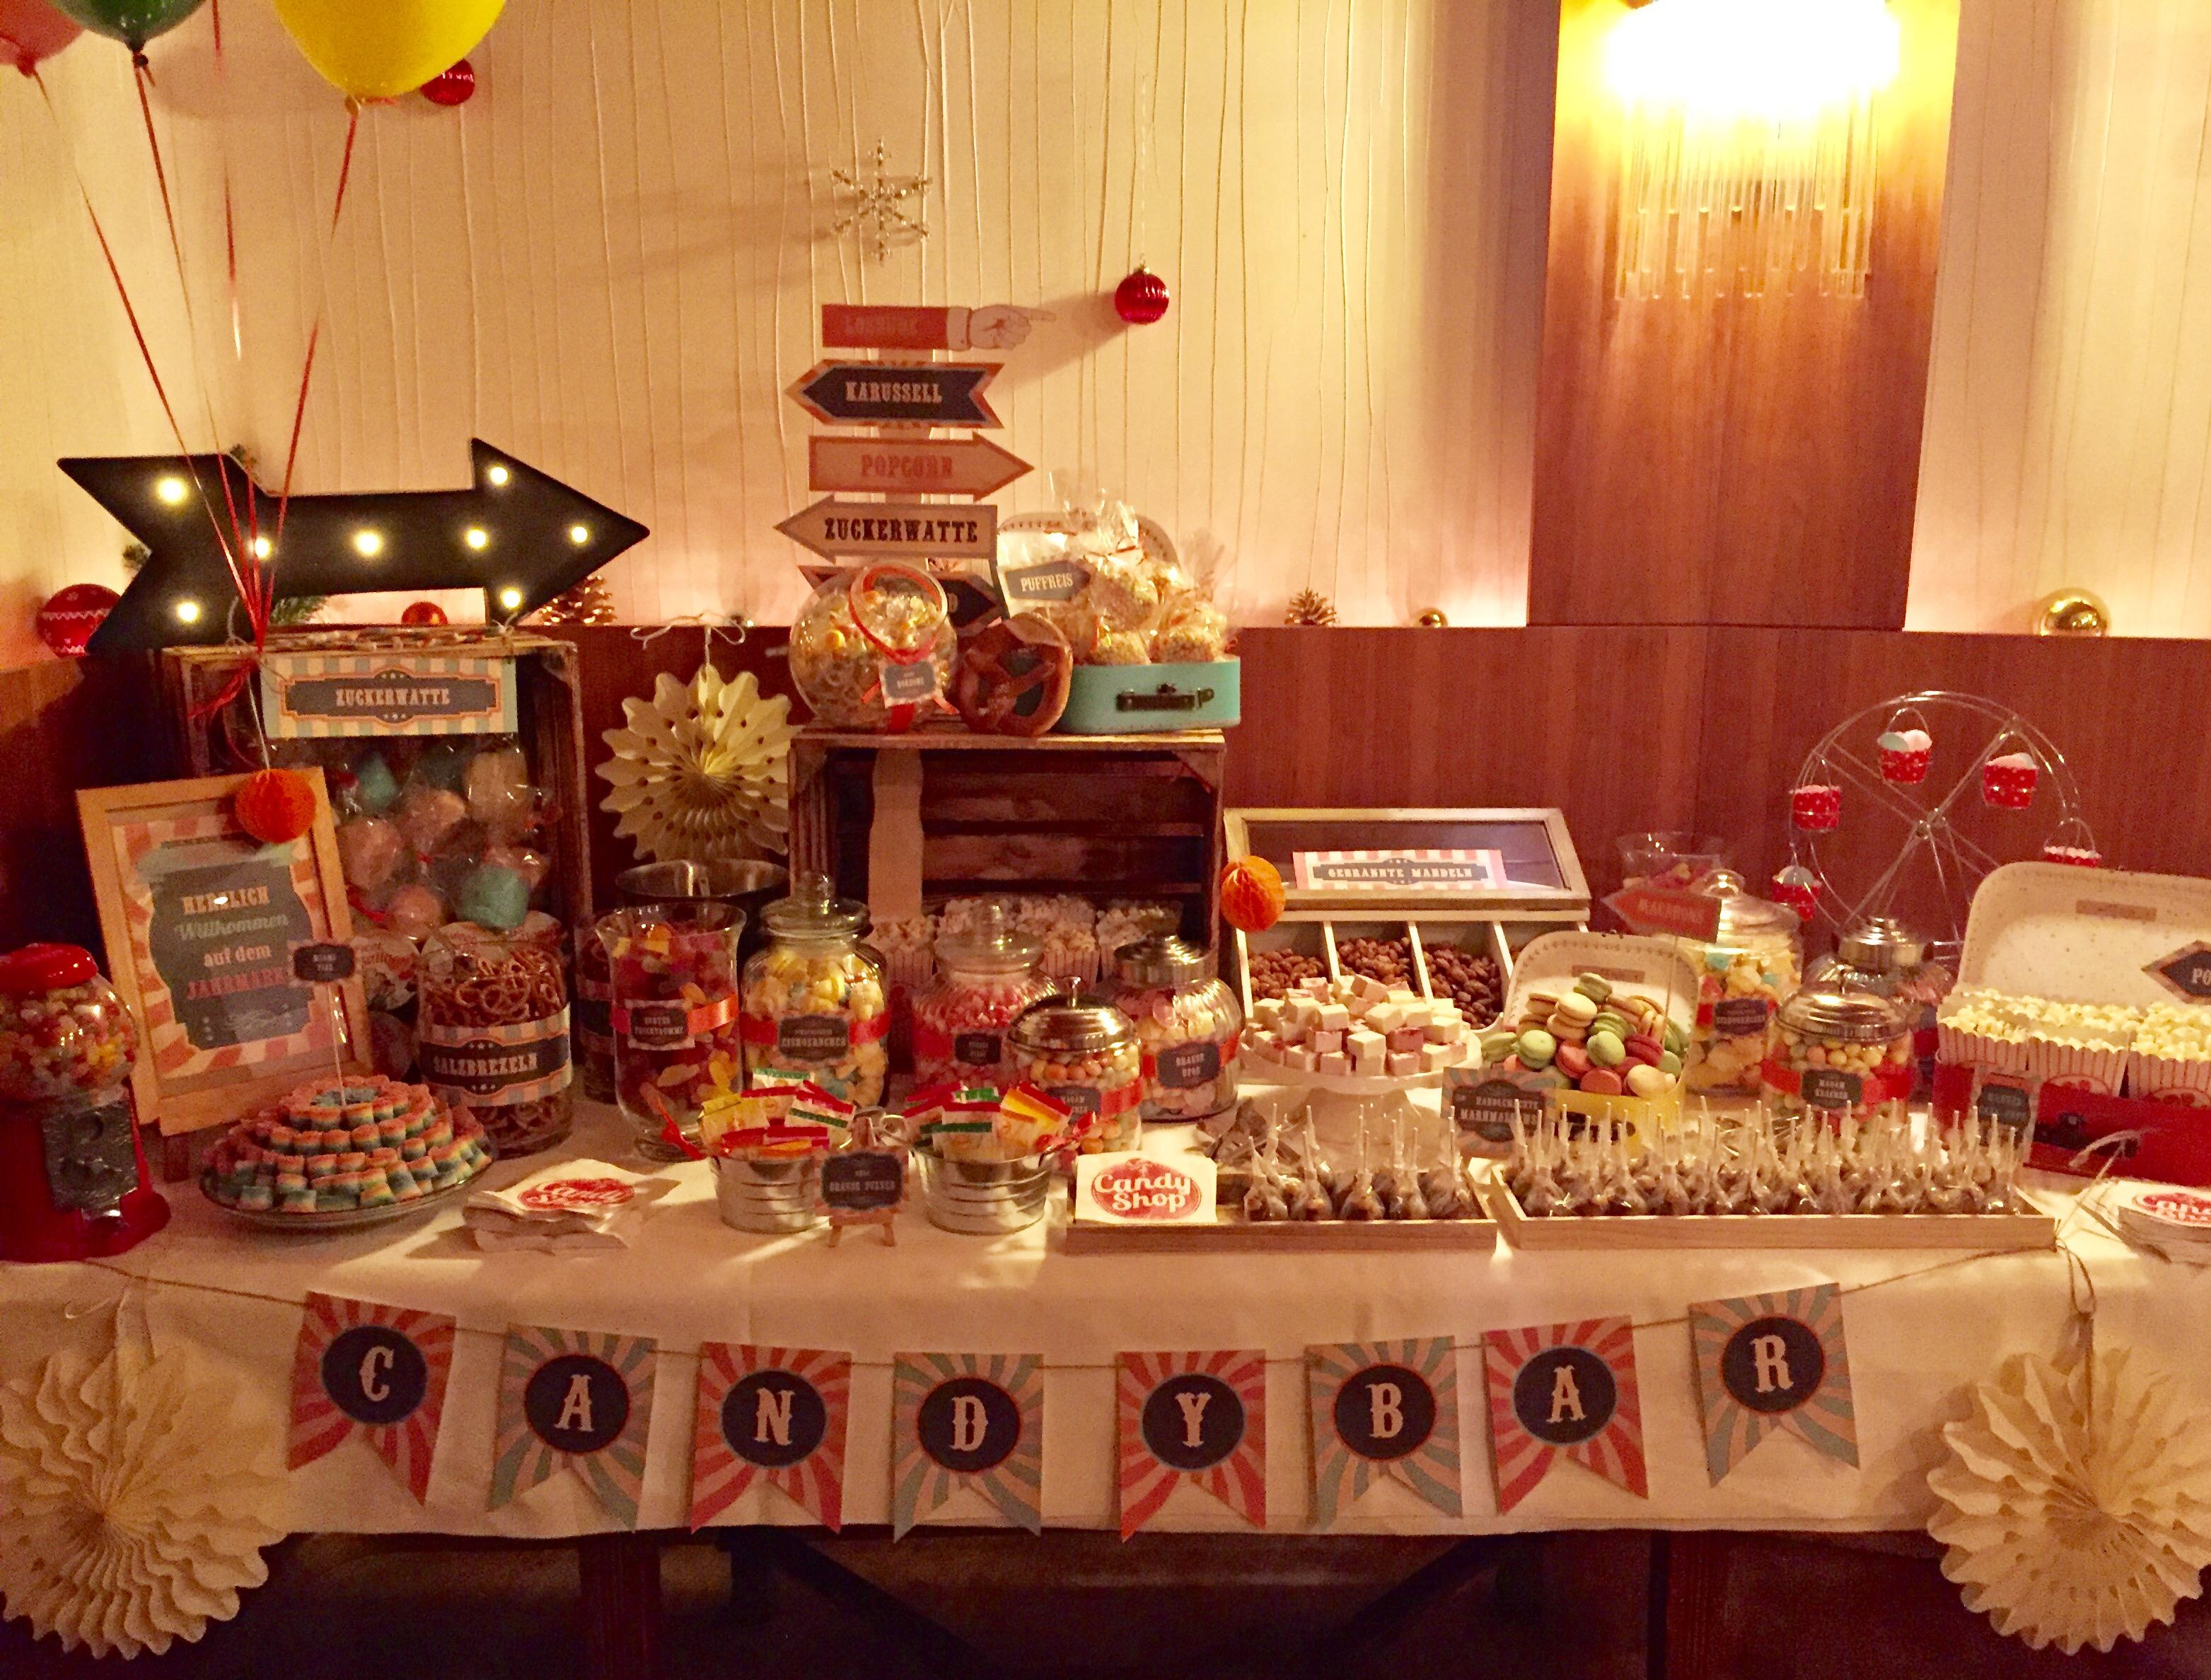 candy-bar-stuttgart-mieten-motto-theme-jahrmarkt-vintage-fun-fair